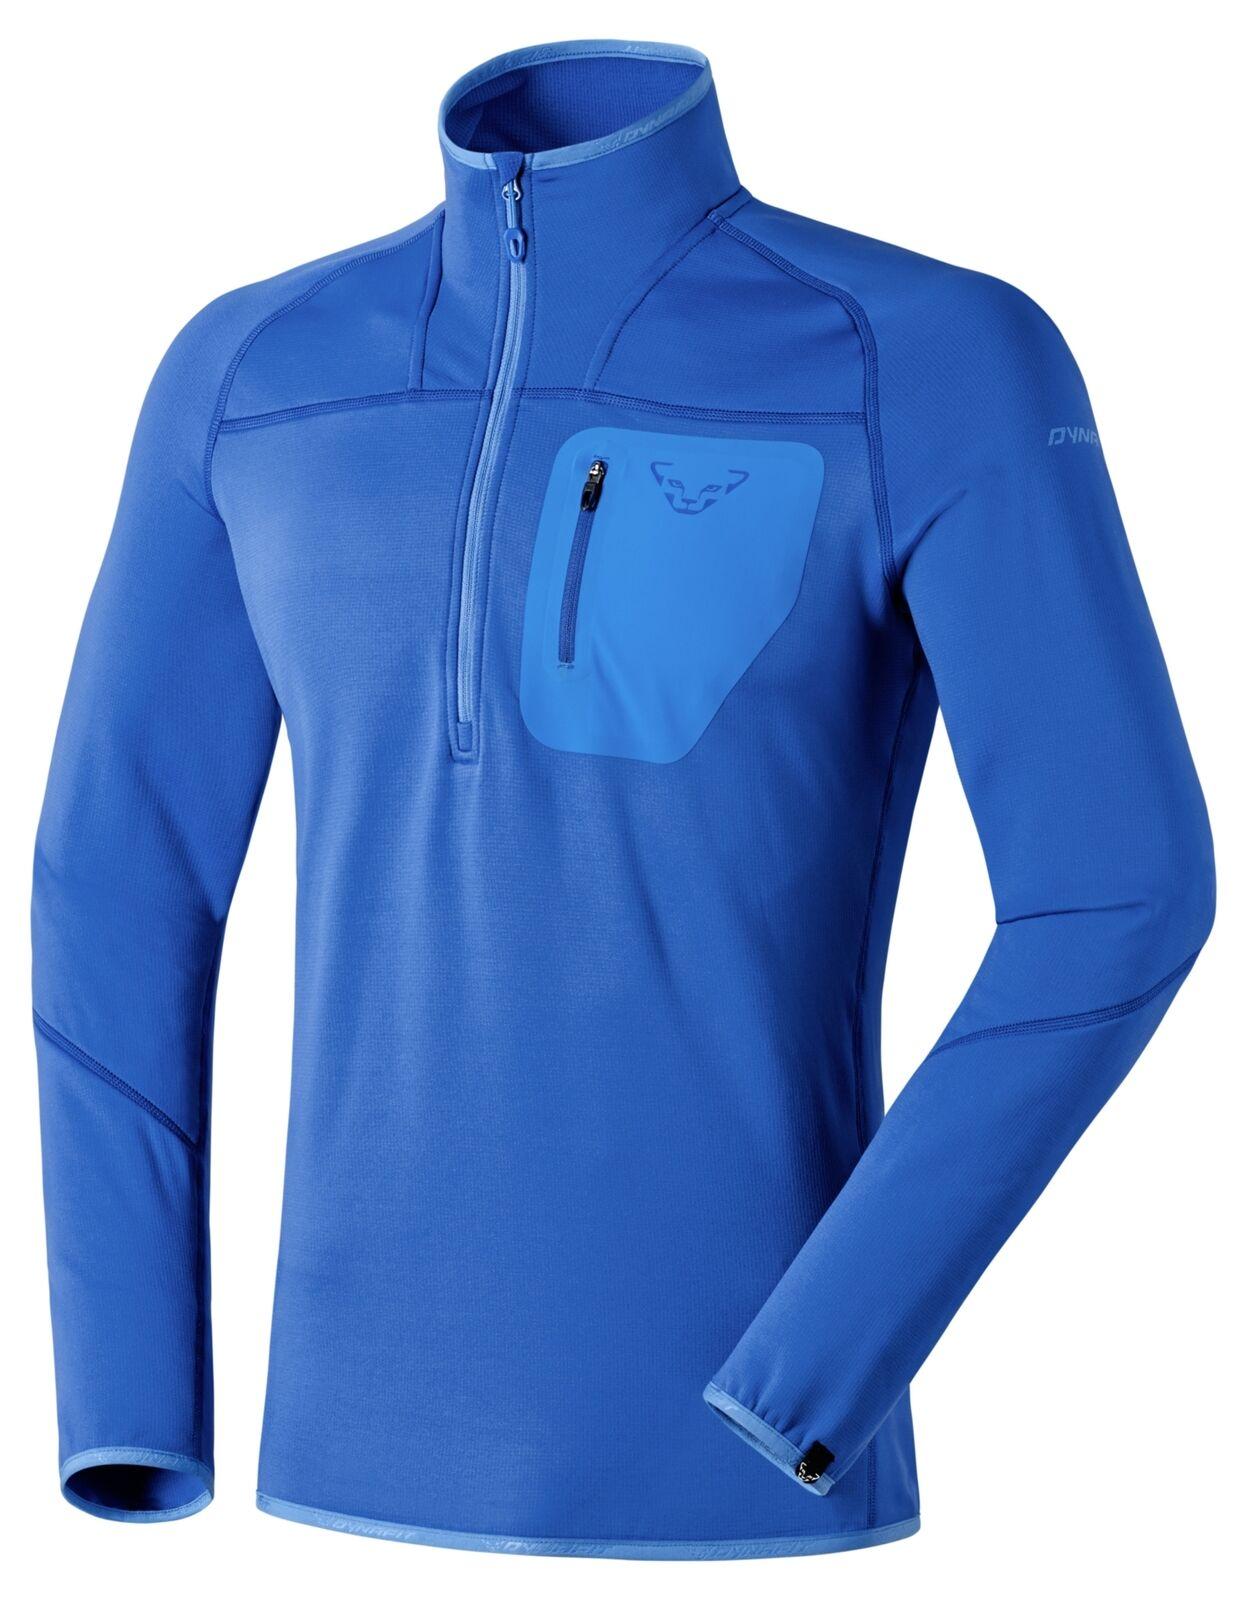 NEW Dynafit THERMAL Voltage Mens Medium 1 2 Zip Running Midlayer T-Shirt Ret 130